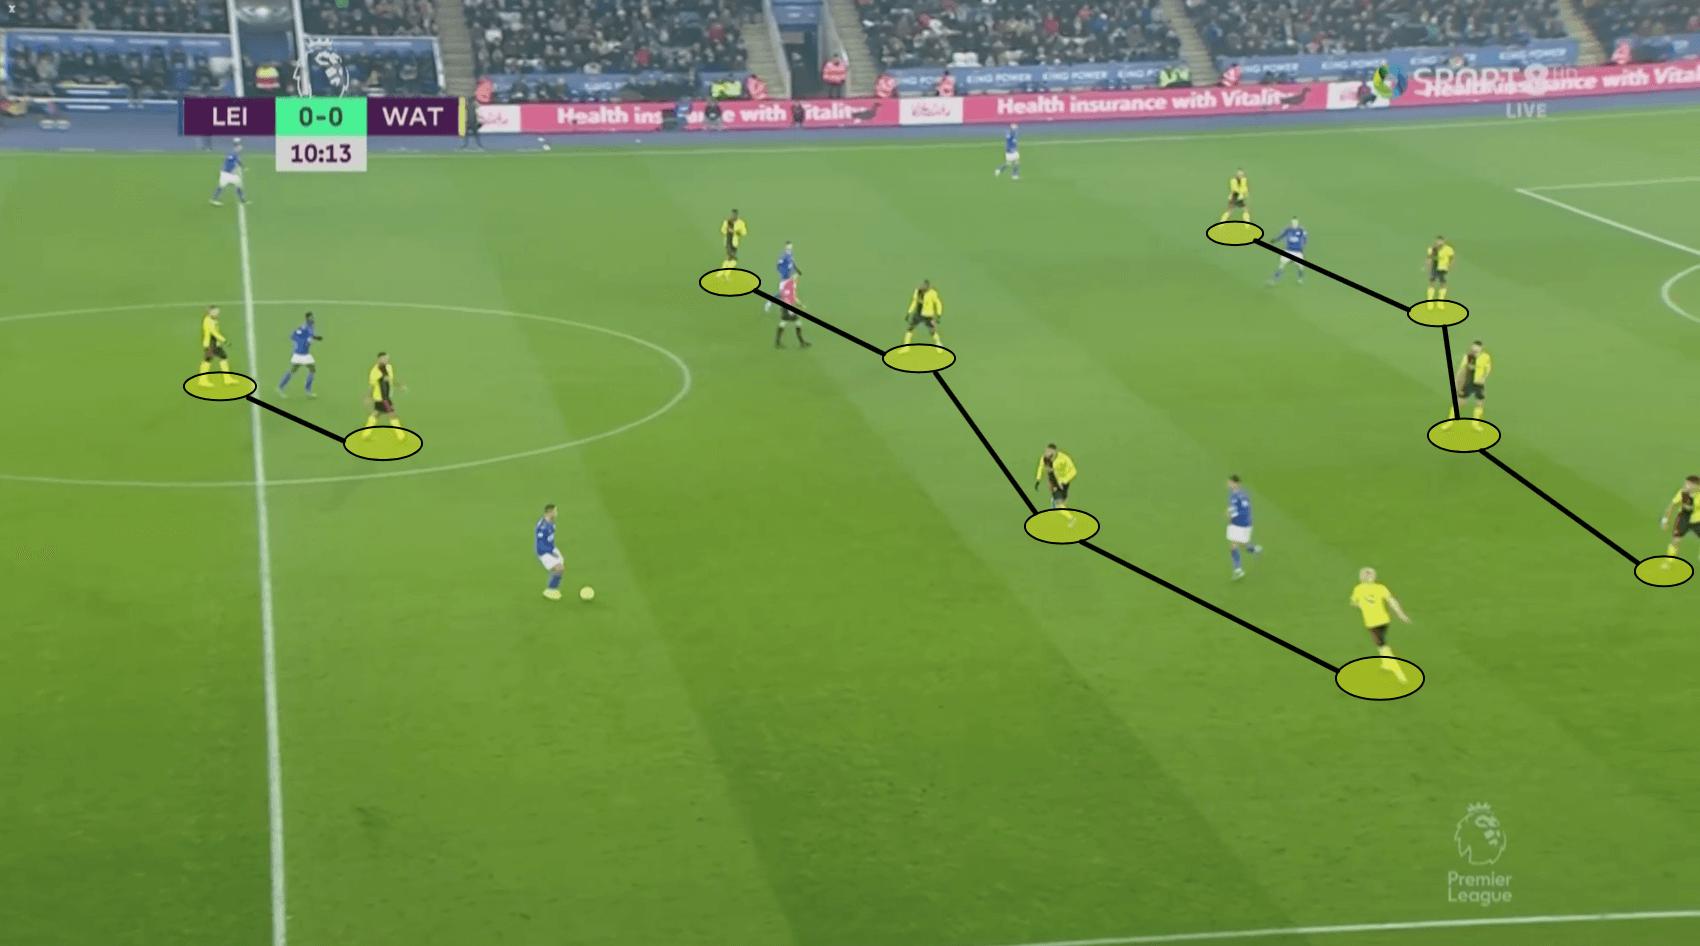 Premier League 2019/20: Leicester City vs Watford – Tactical Analysis tactics